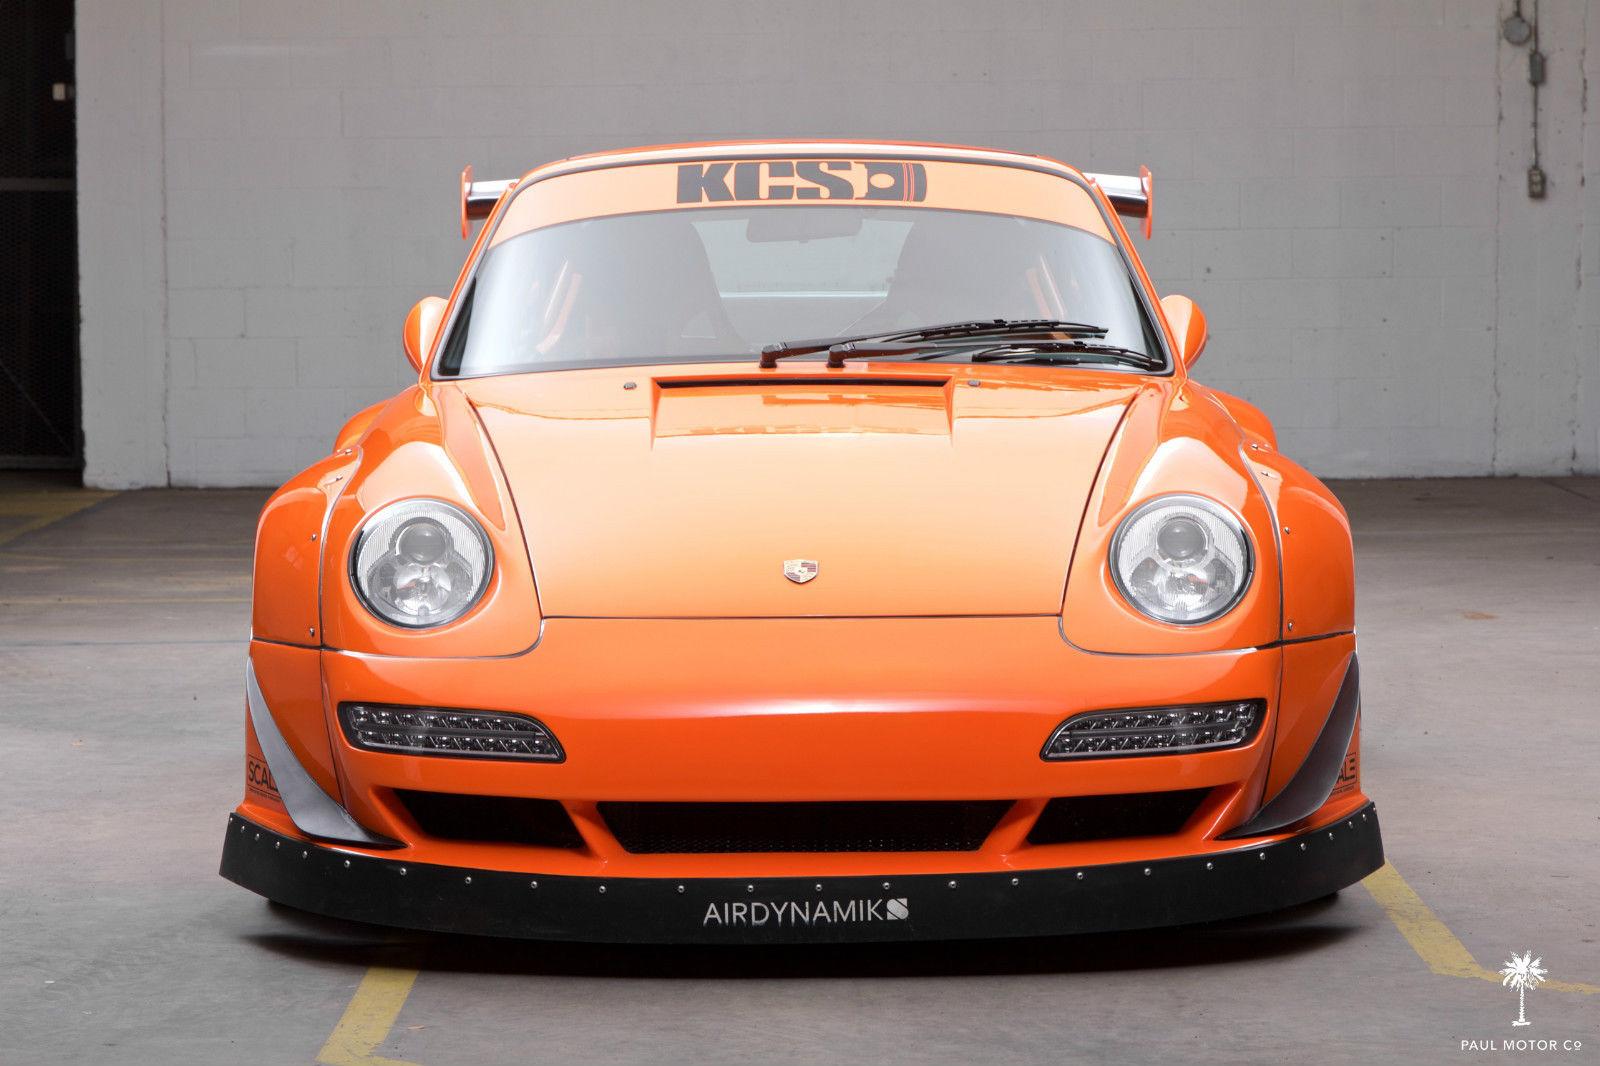 Crazy Widebody Corvette Powered 1995 Porsche 911 Hits